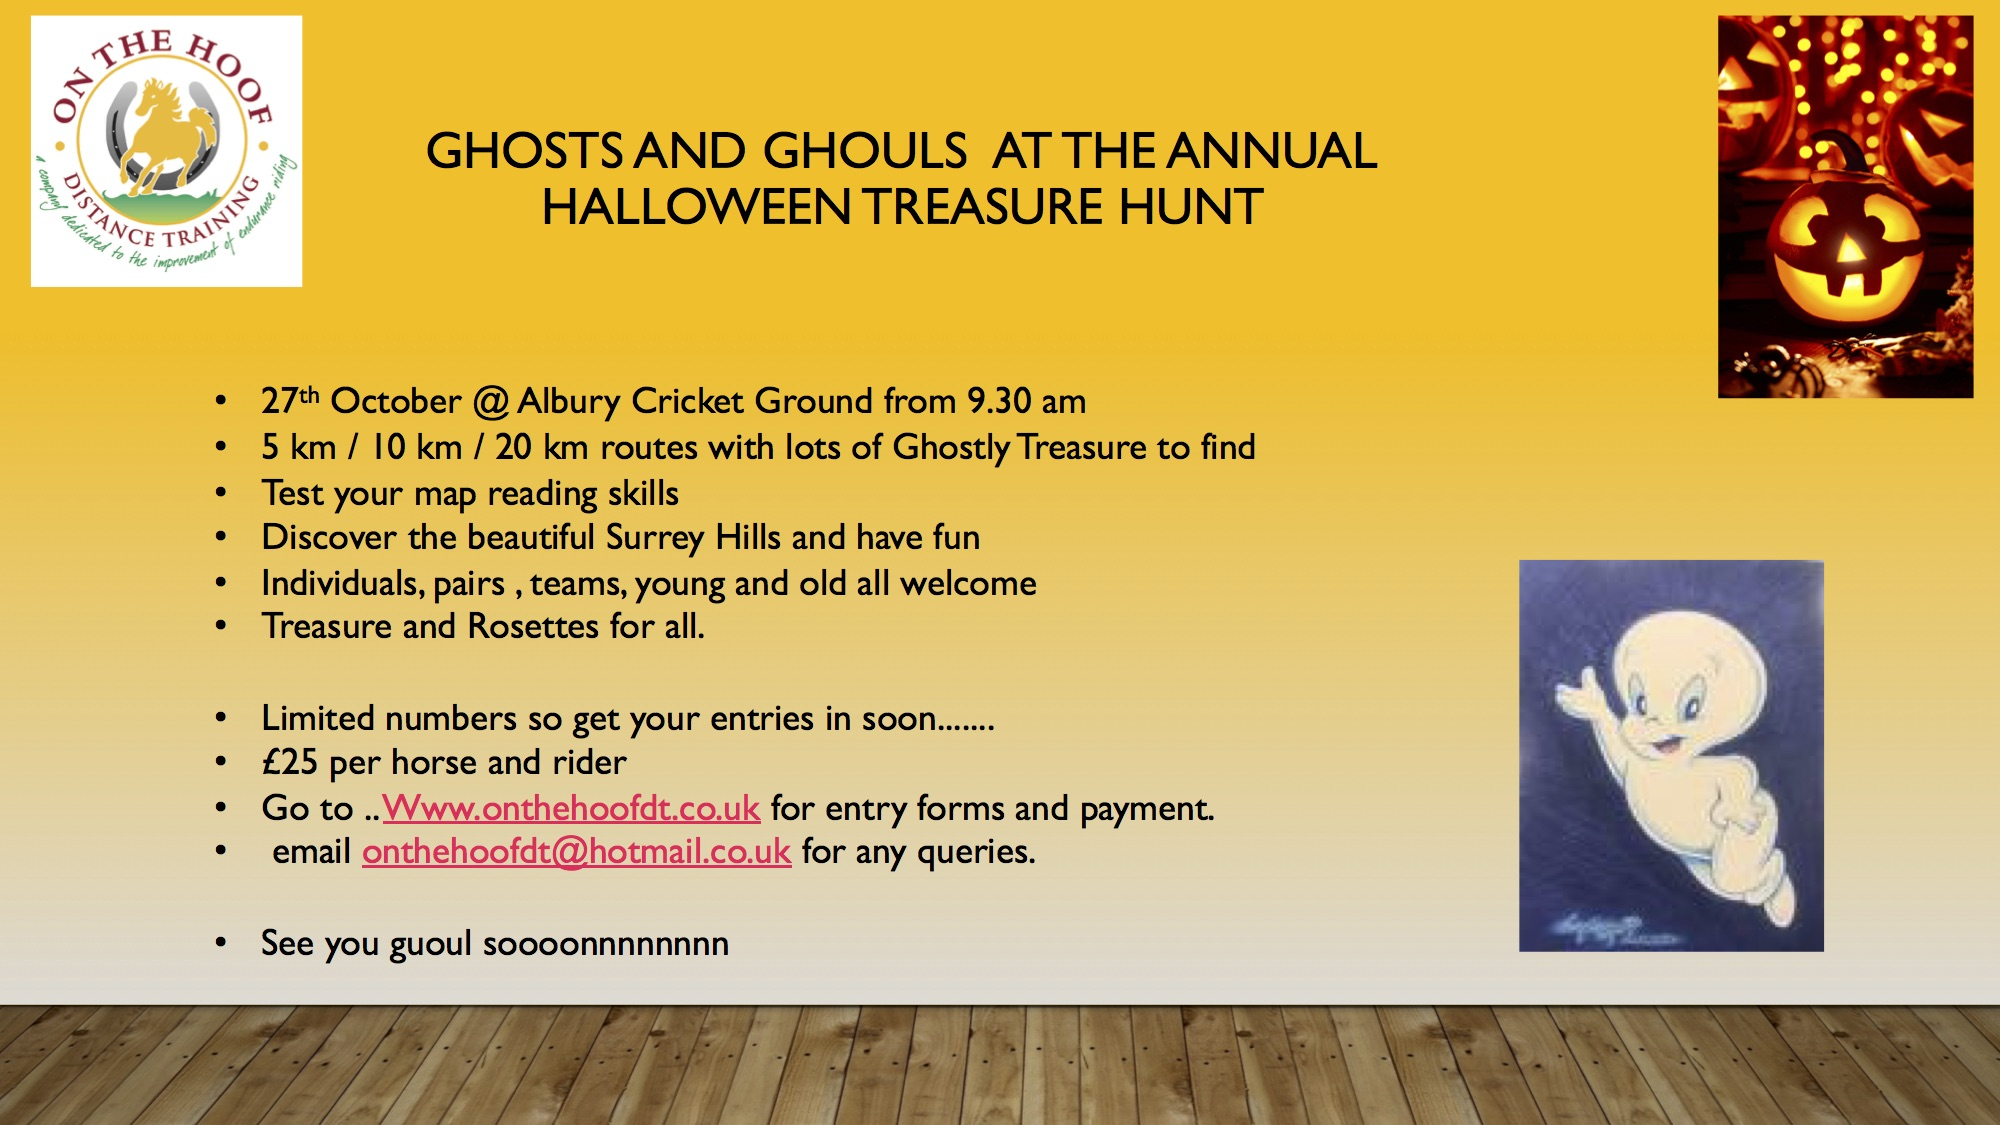 Halloween Treasure Hunt 27th October